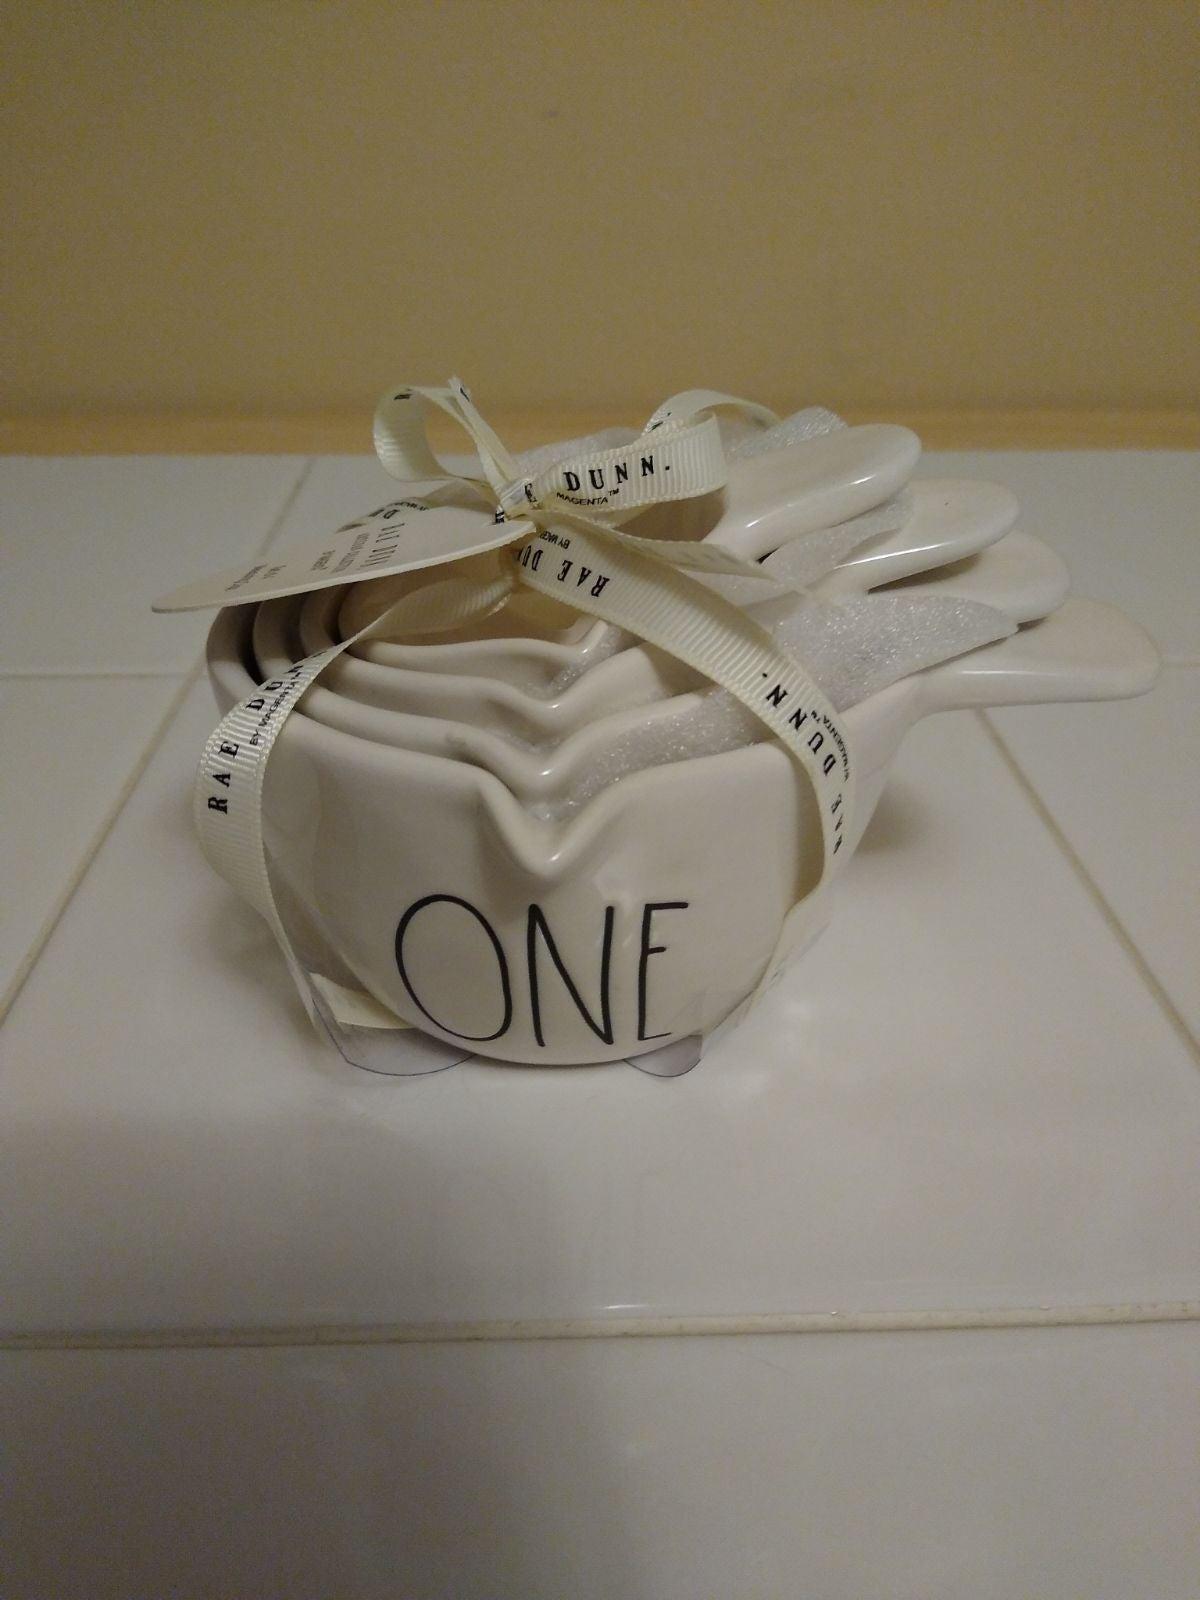 Rae Dunn White Handle Measuring Cups